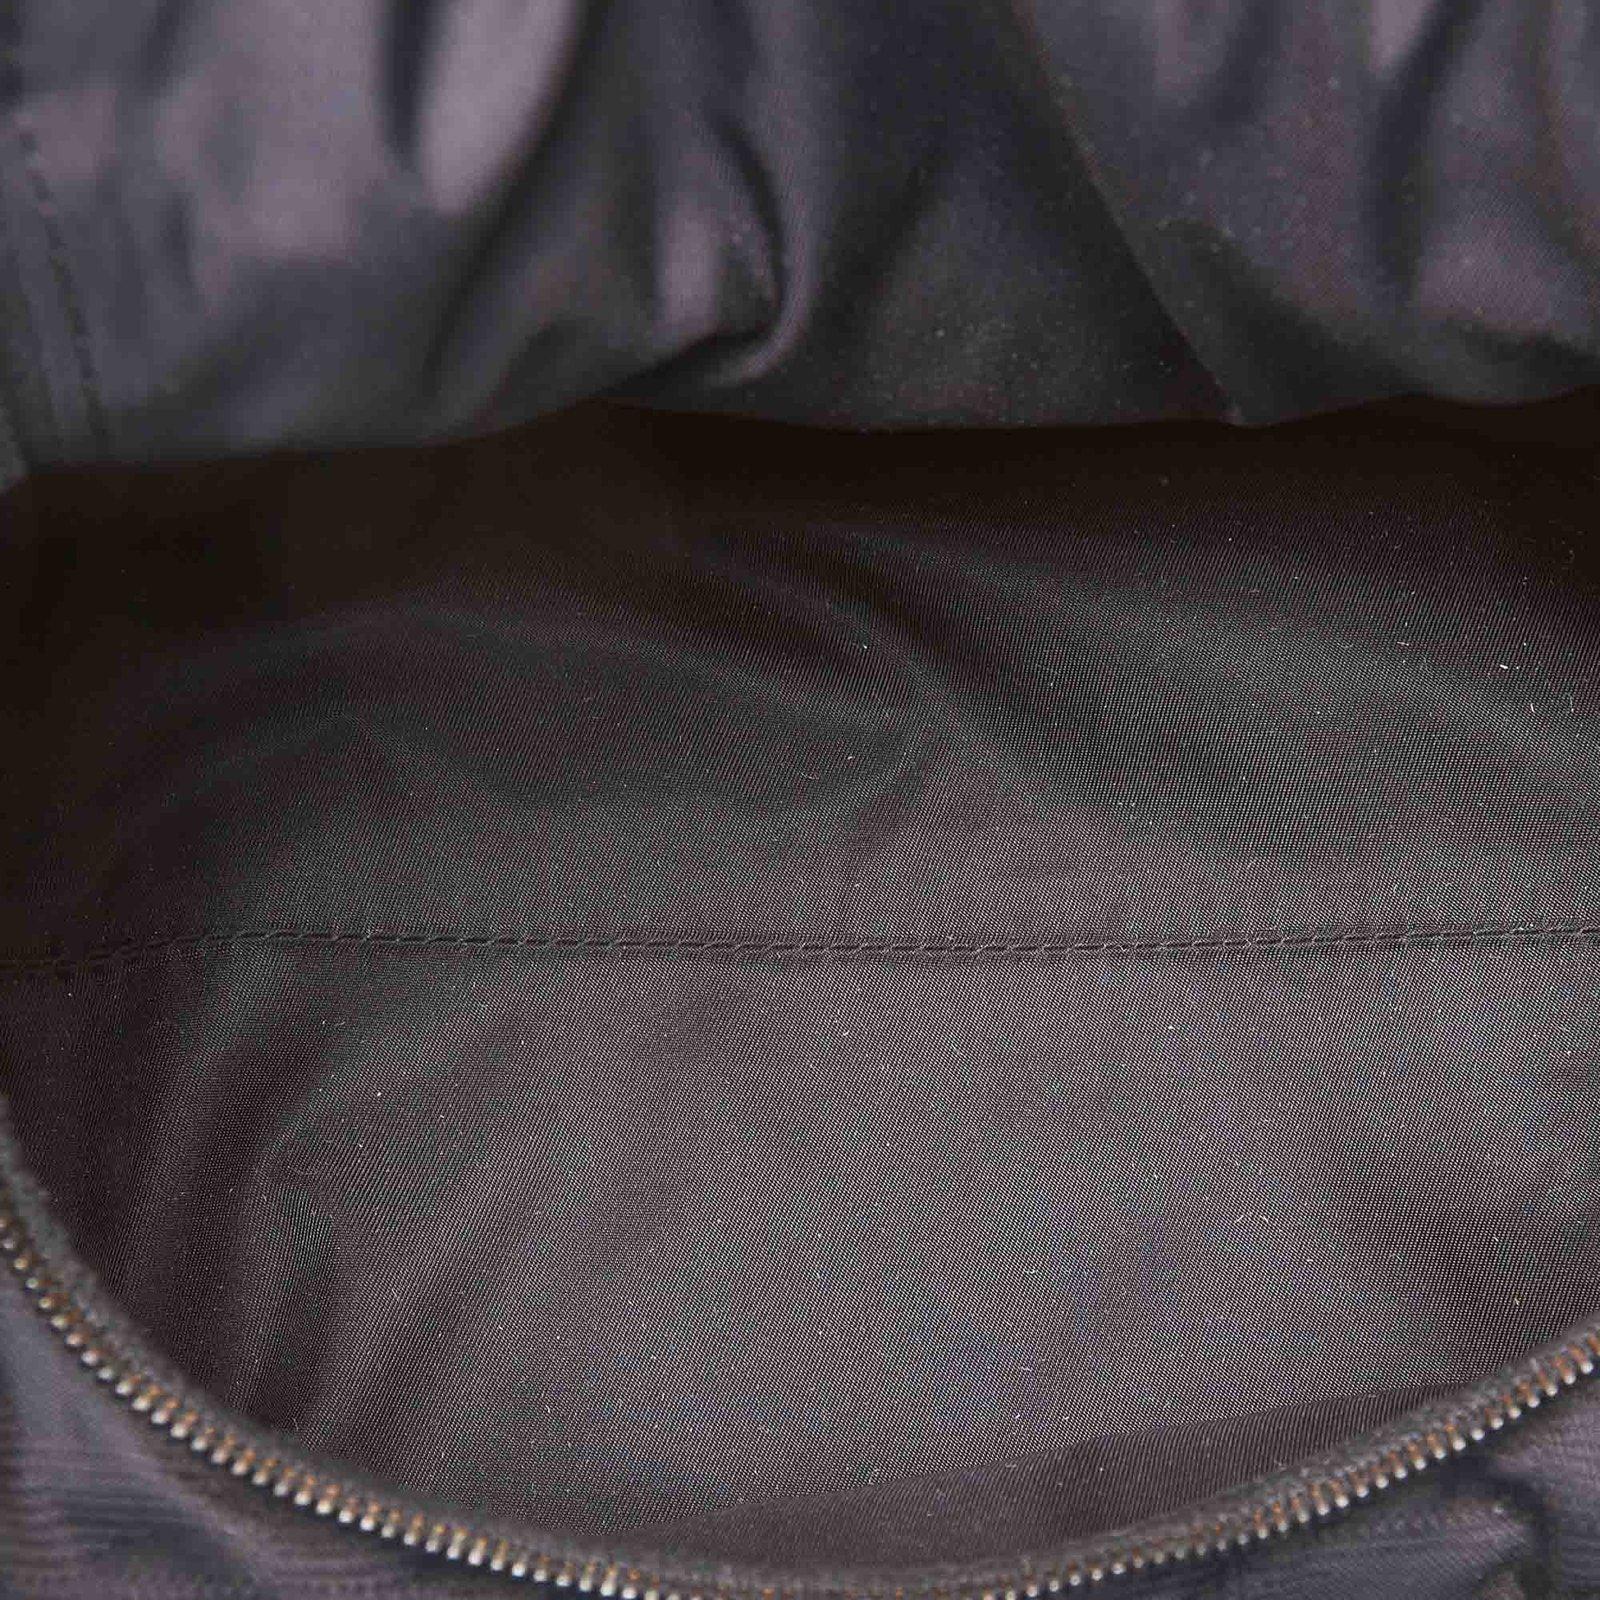 672b54422a32 Chanel New Travel Line Vanity Bag Handbags Leather,Other,Cloth Black  ref.90745 - Joli Closet